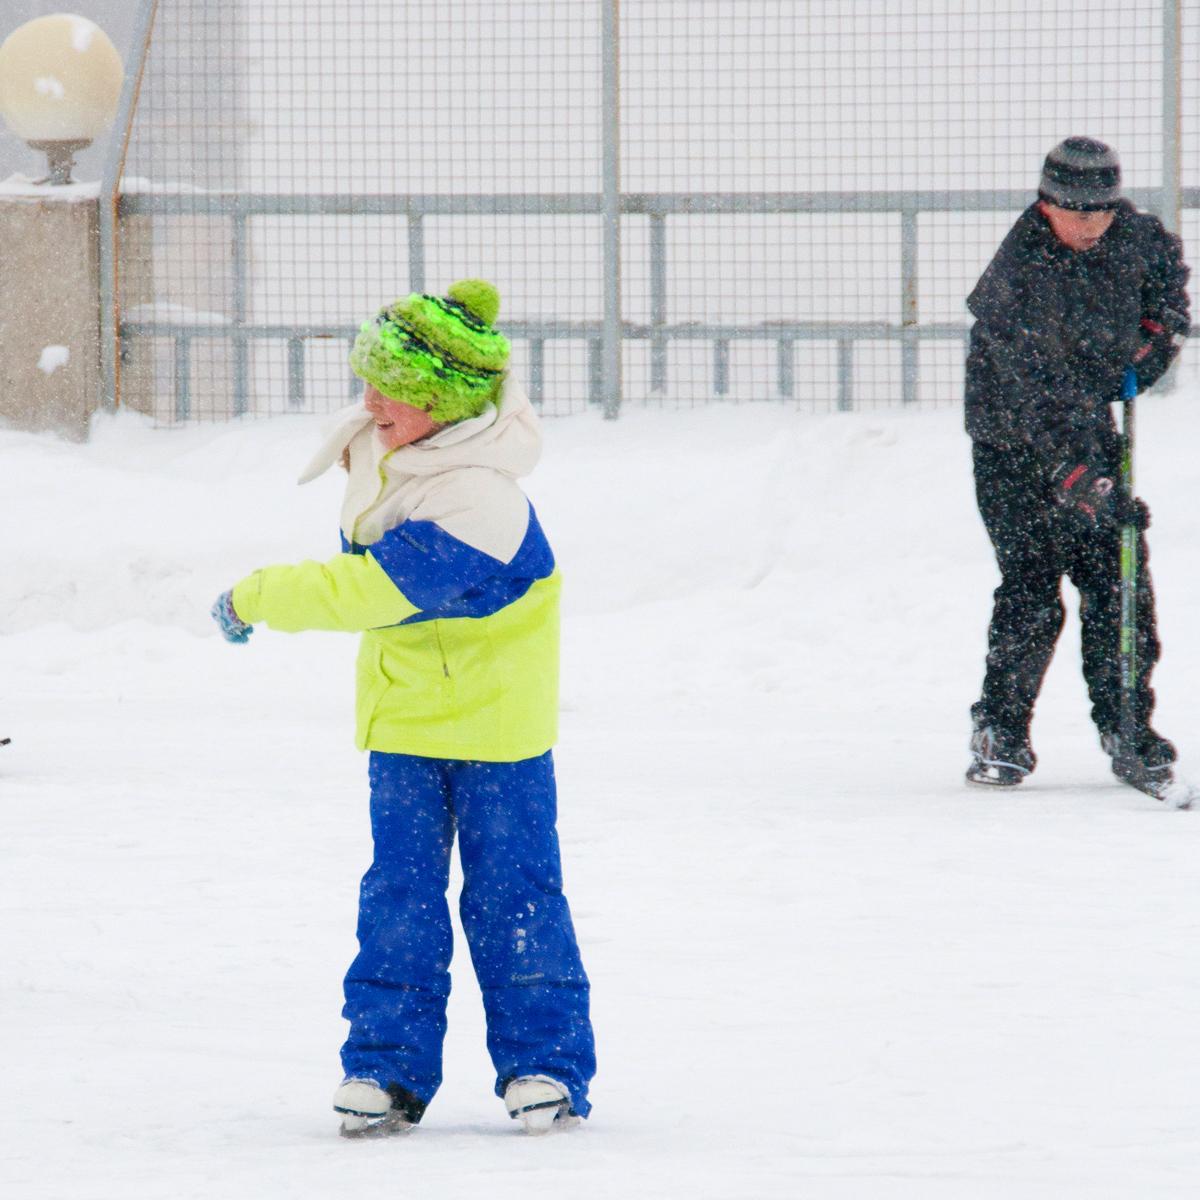 skating, Active, Leisure, Winter, Training, HQ Photo